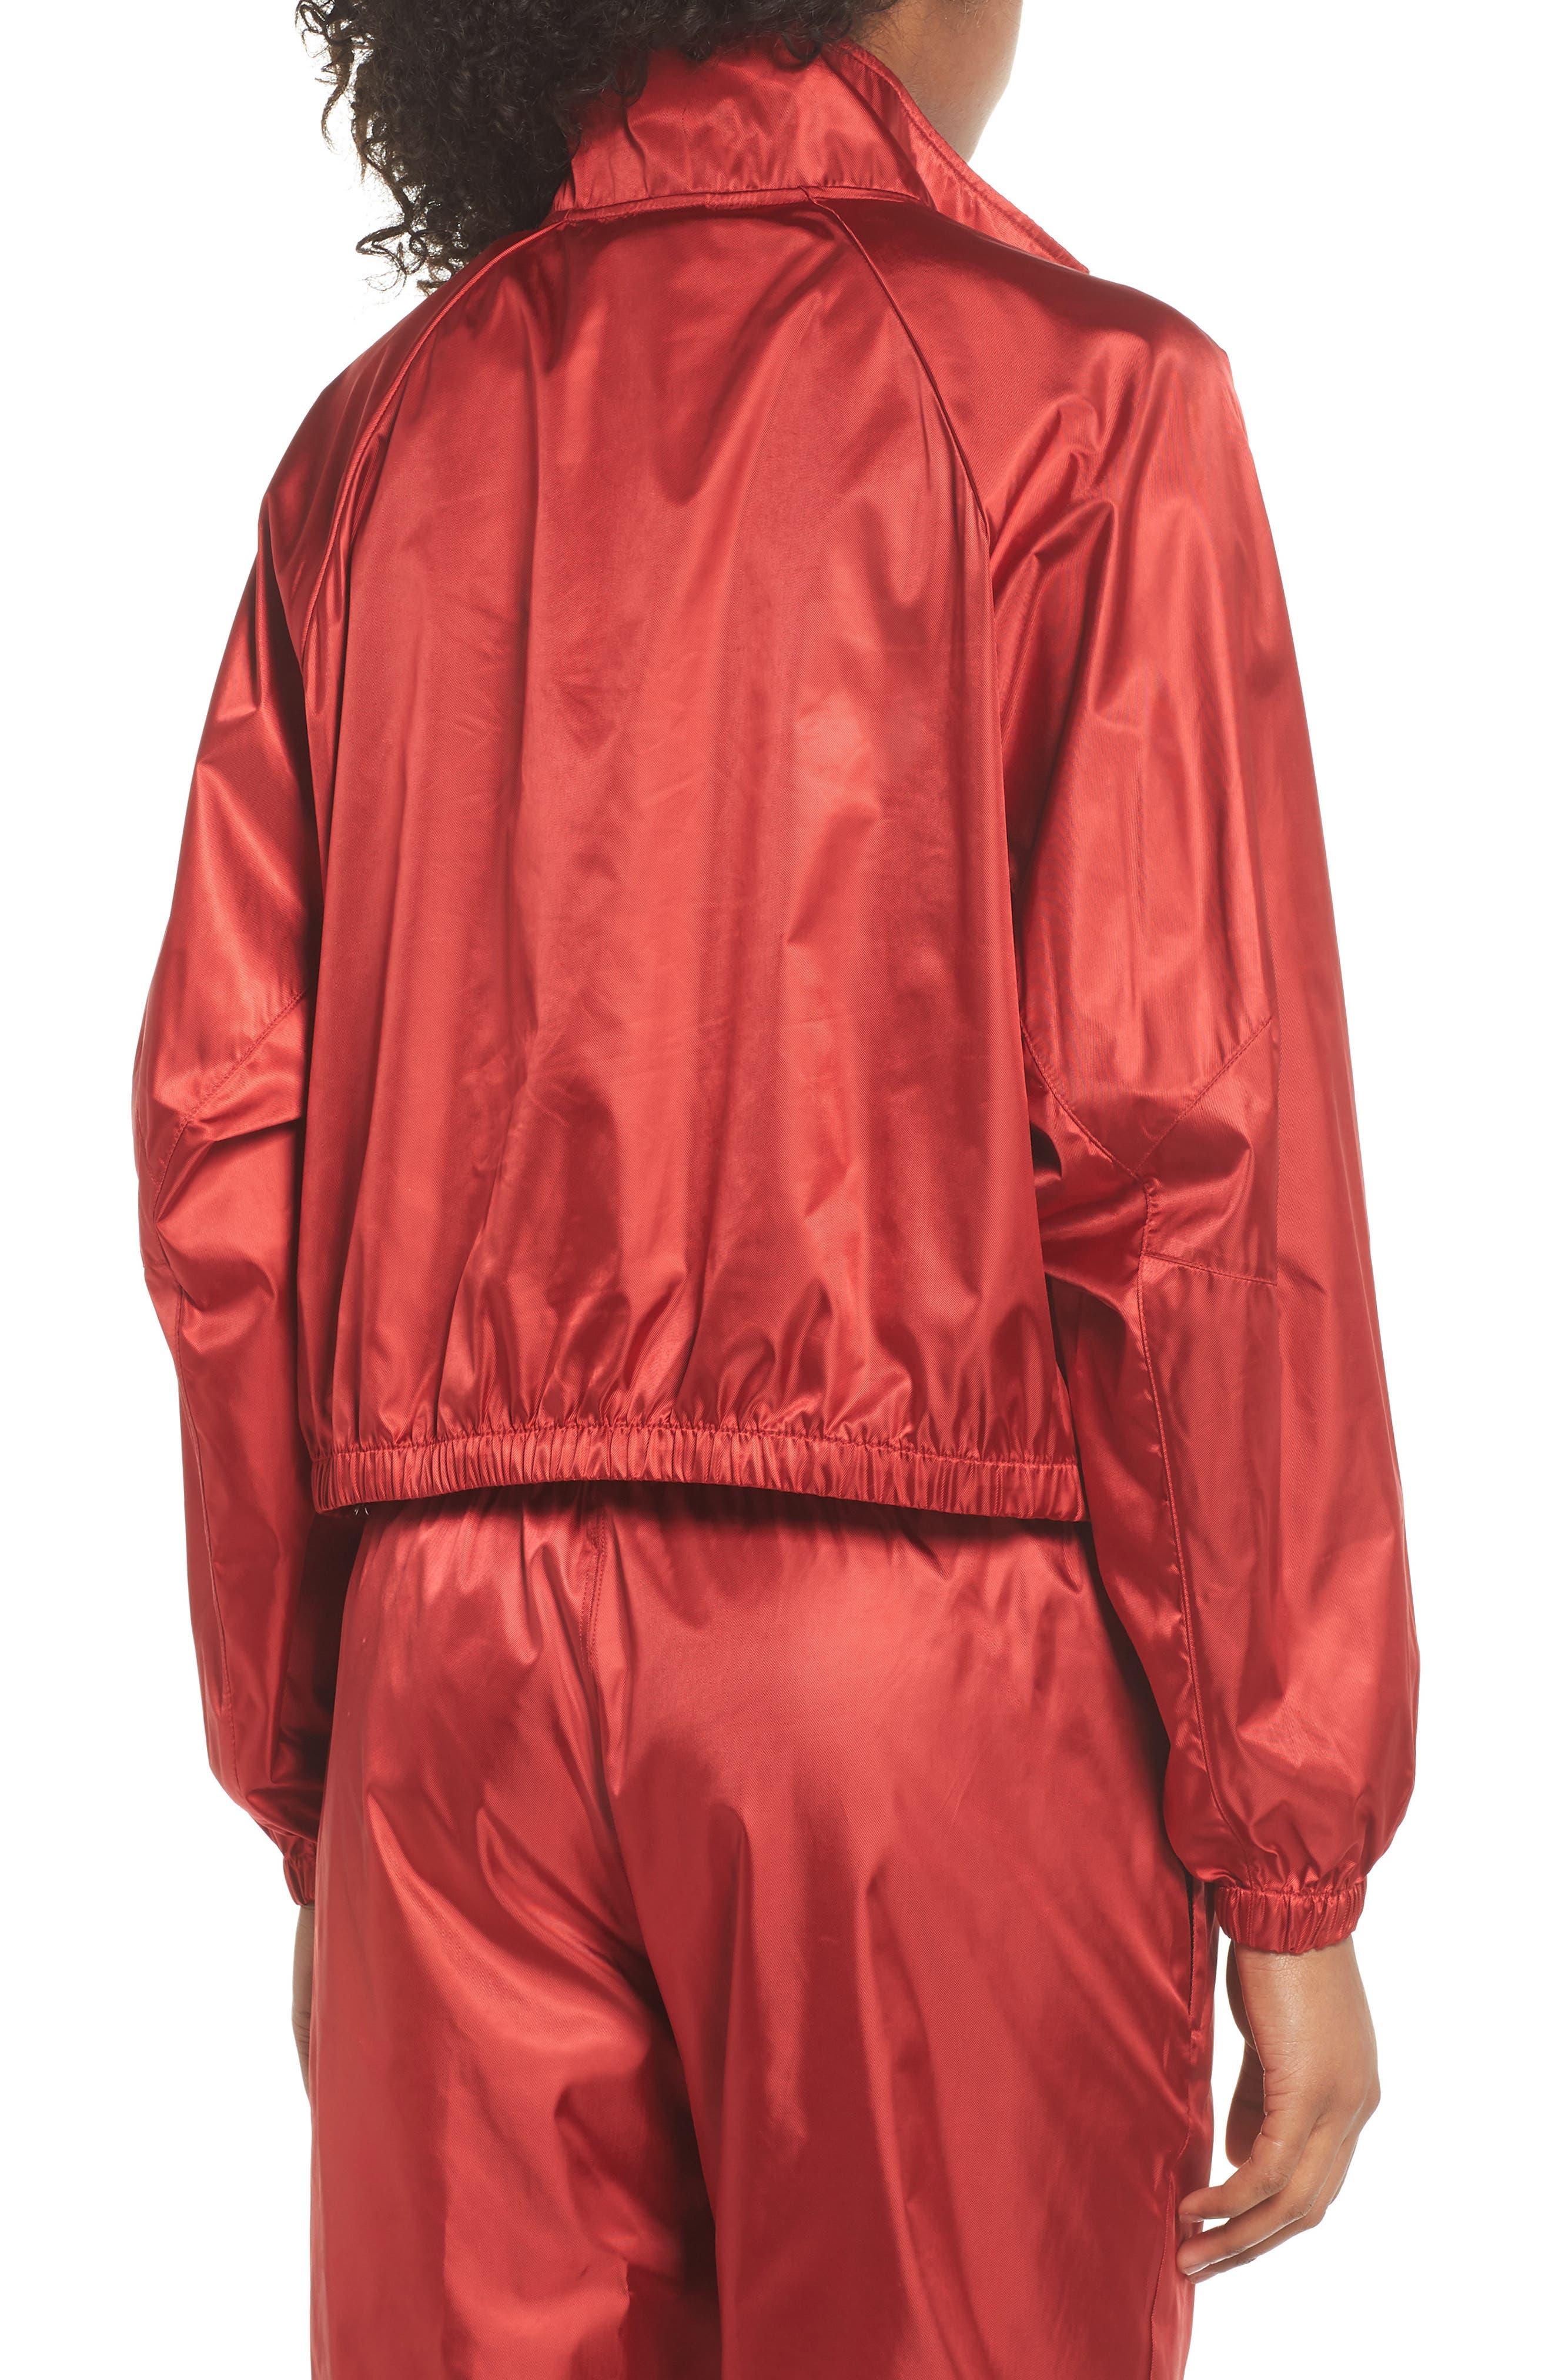 NikeLab Collection Satin Half Zip Top,                             Alternate thumbnail 2, color,                             Gym Red/ Black